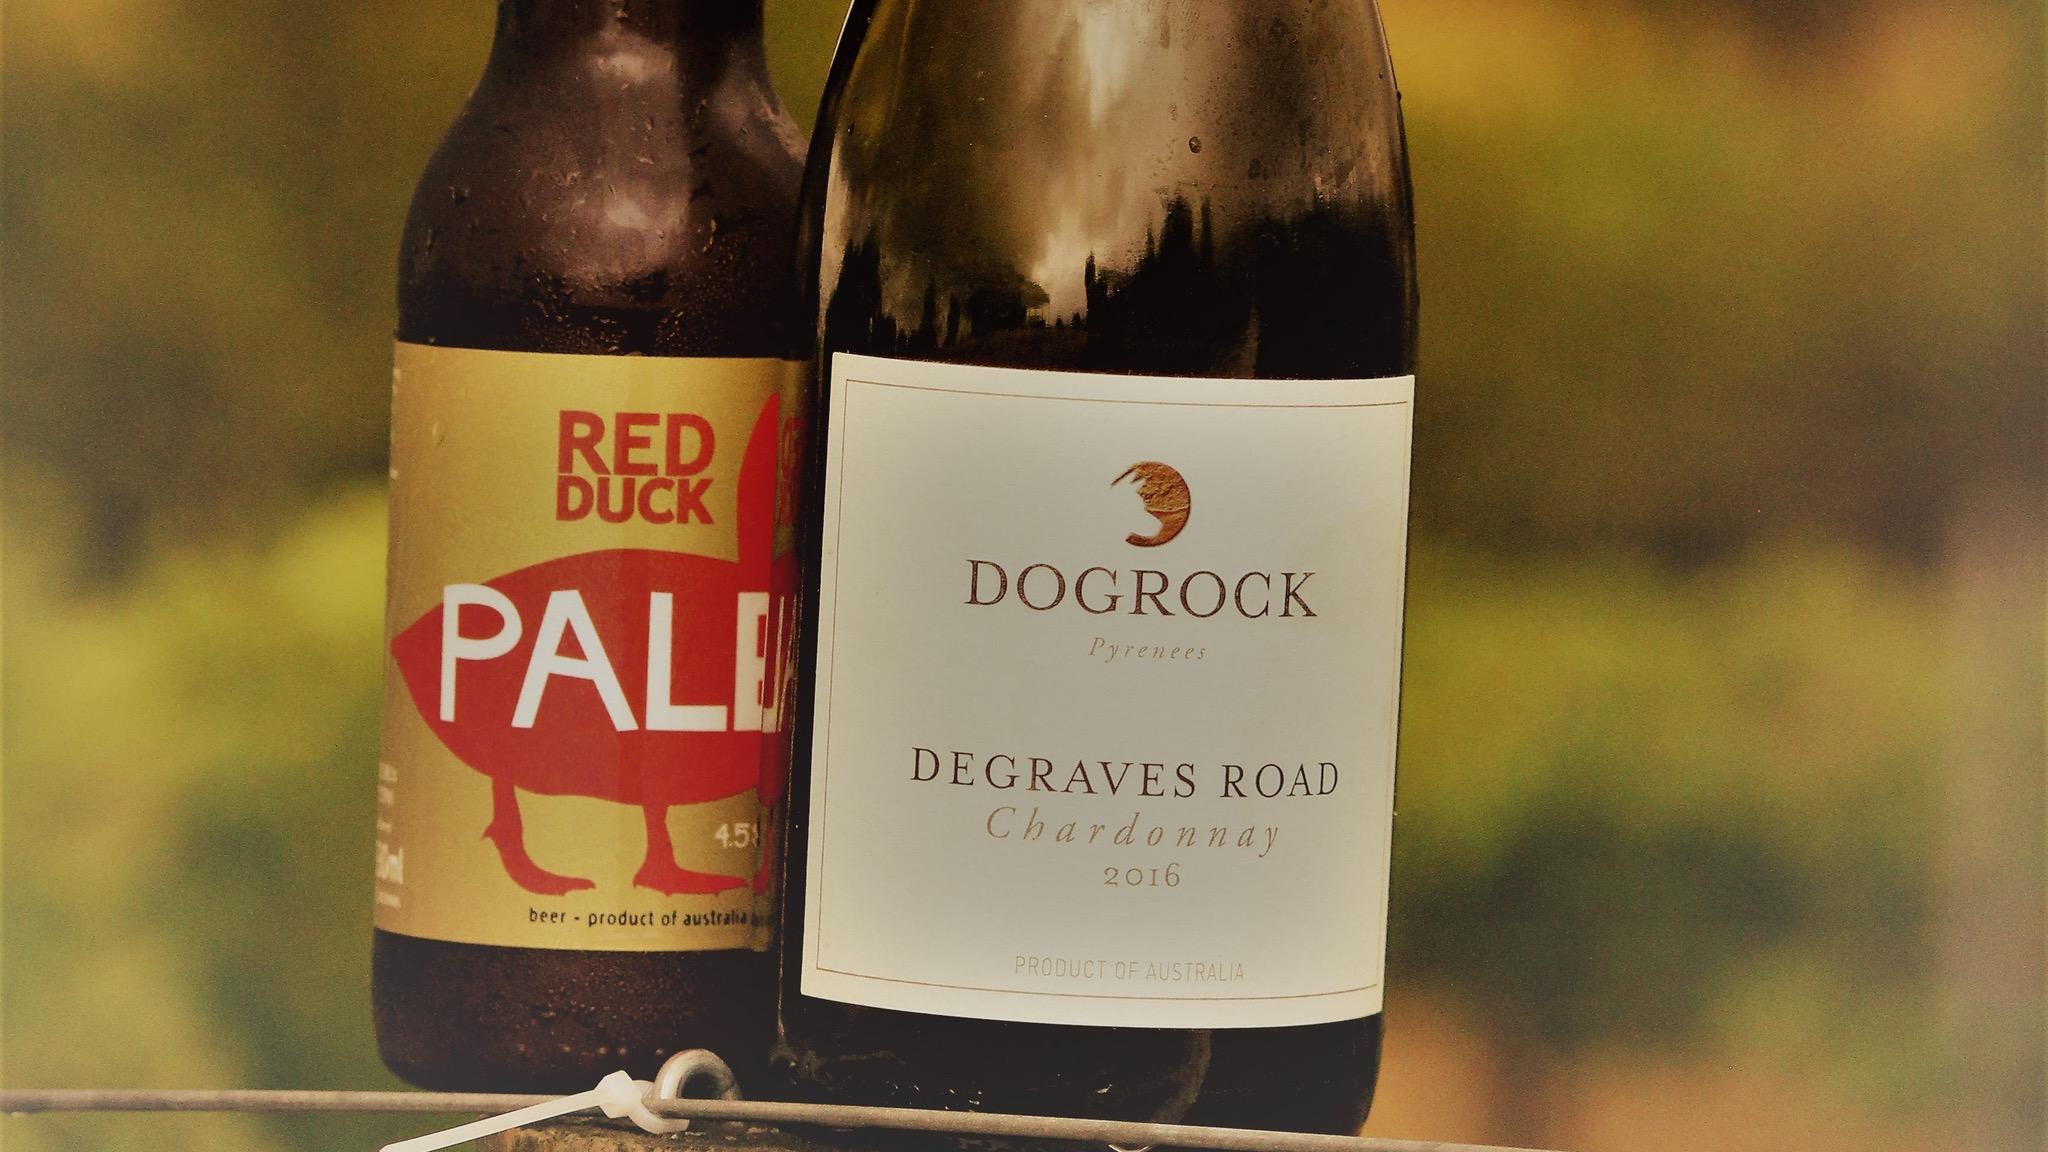 Red Duck beer or DogRock wine?